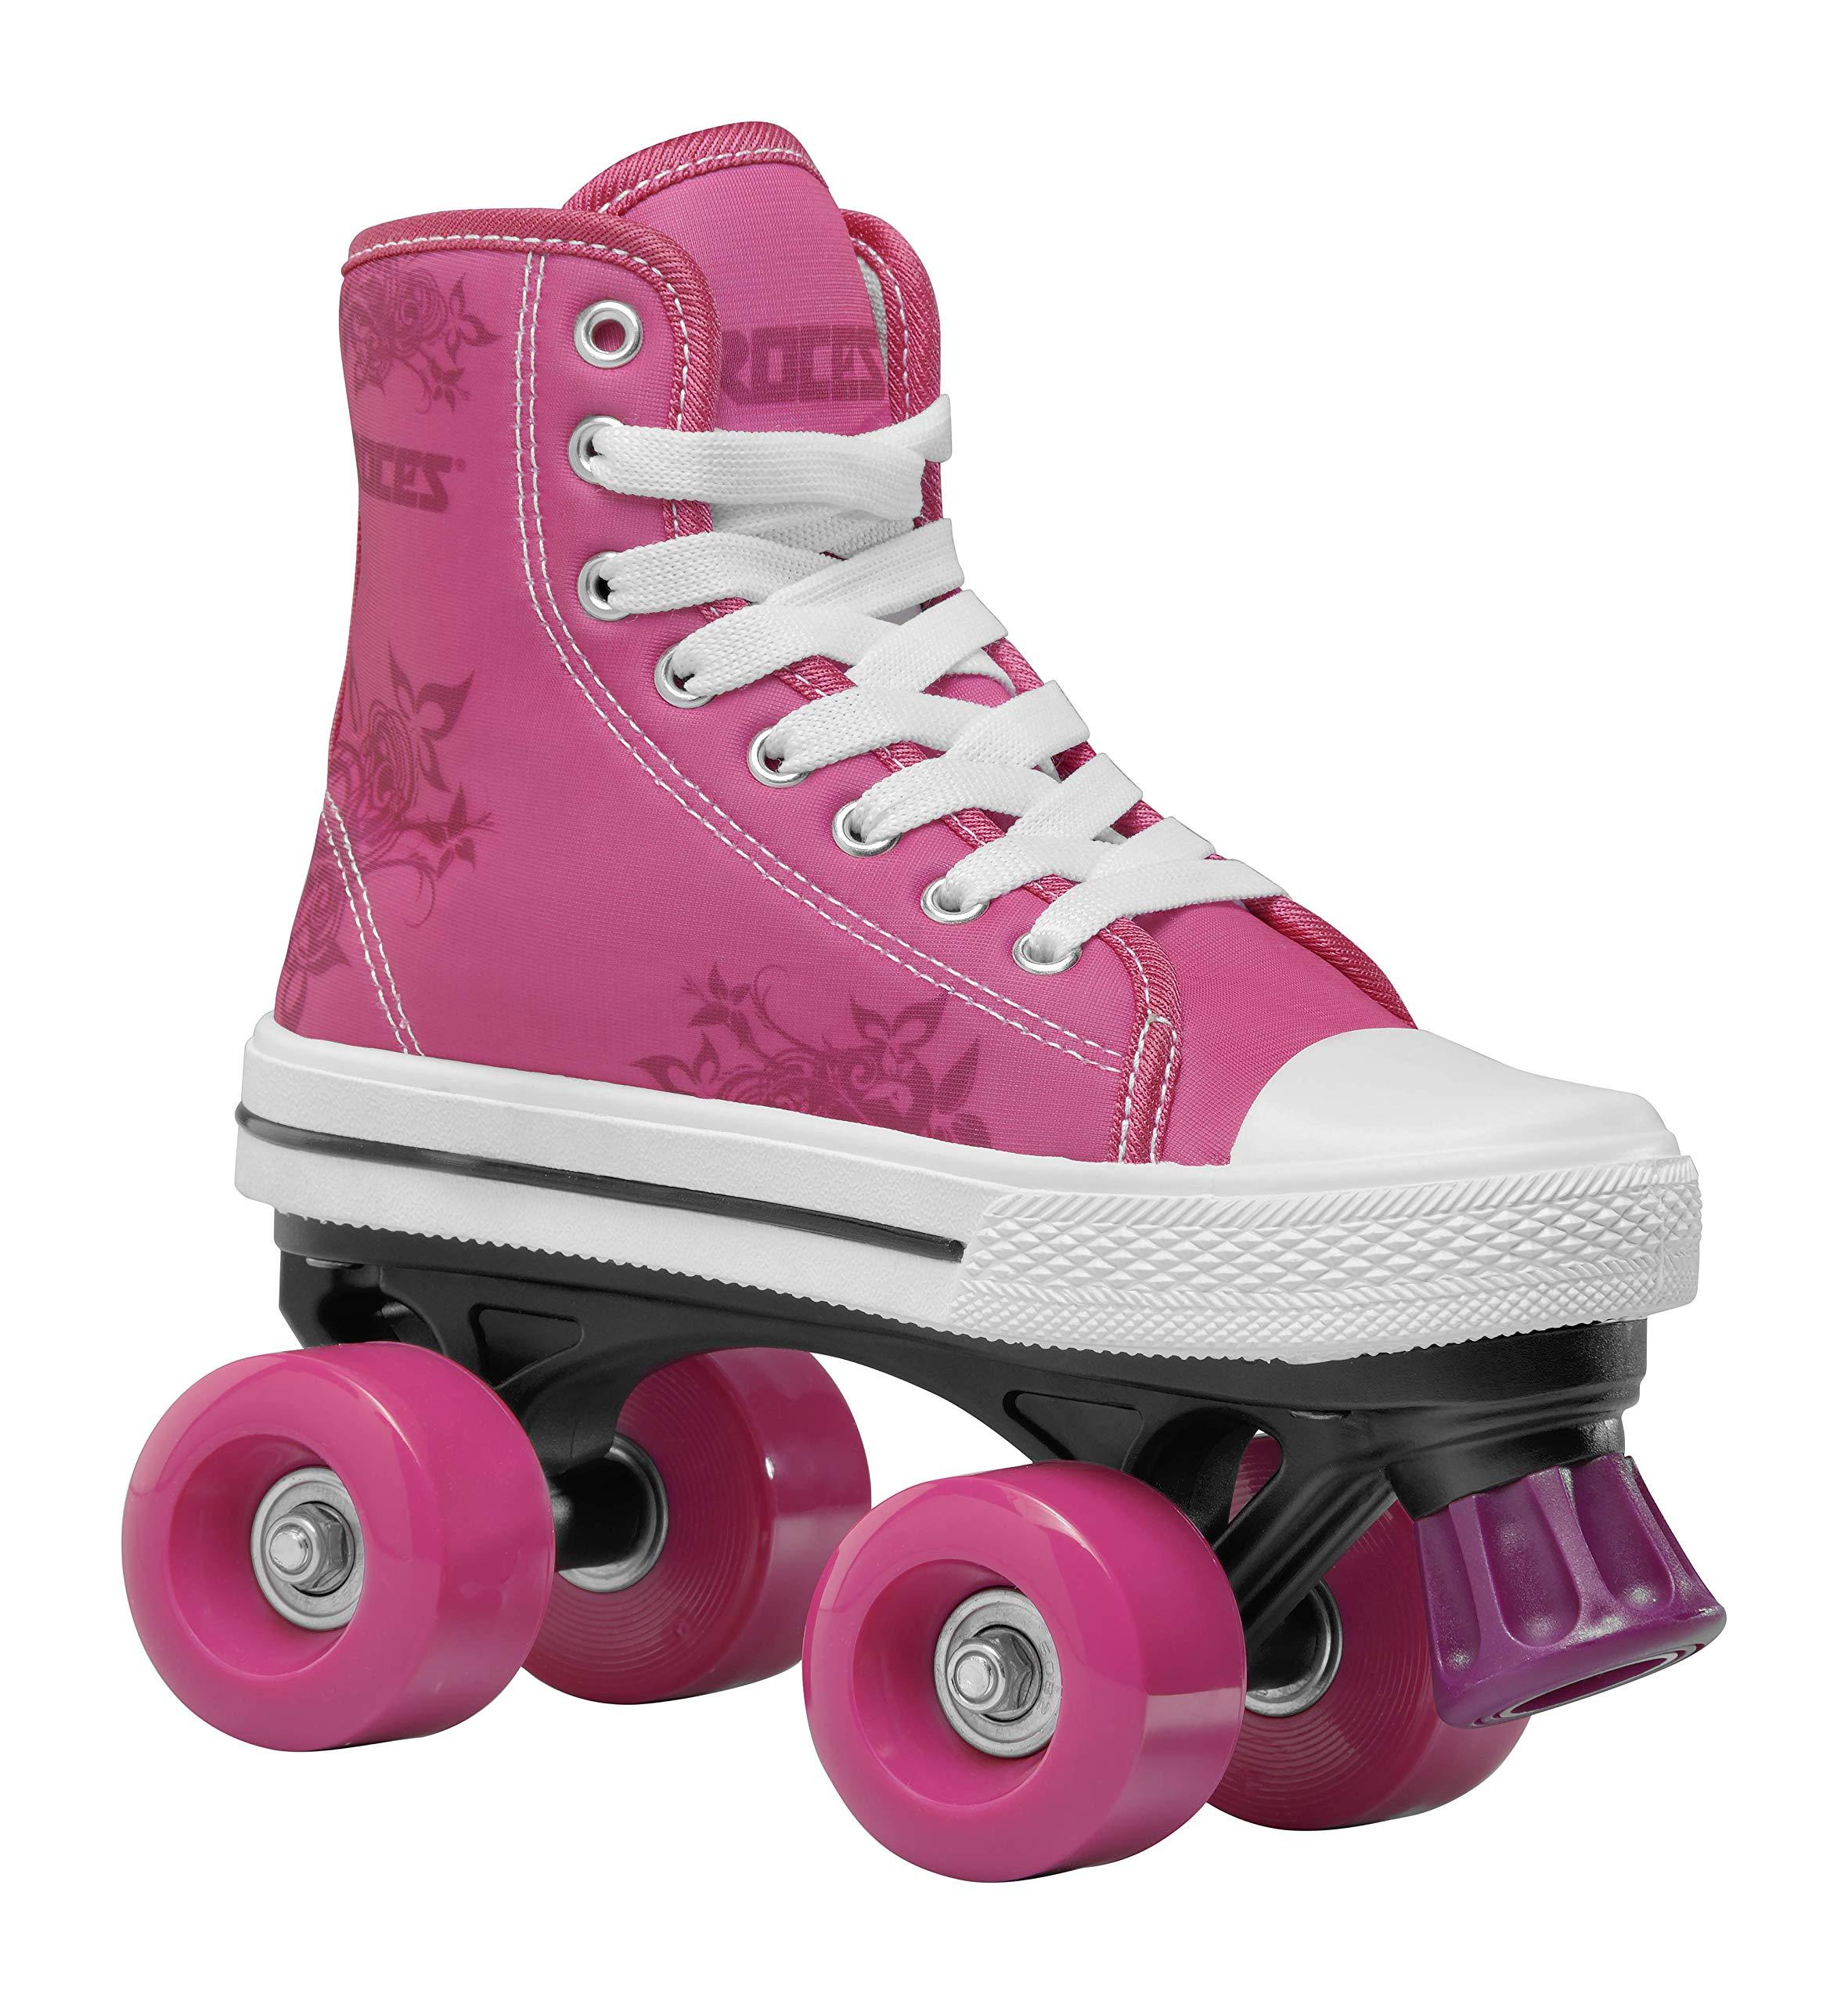 Roces Casual Quad Skate